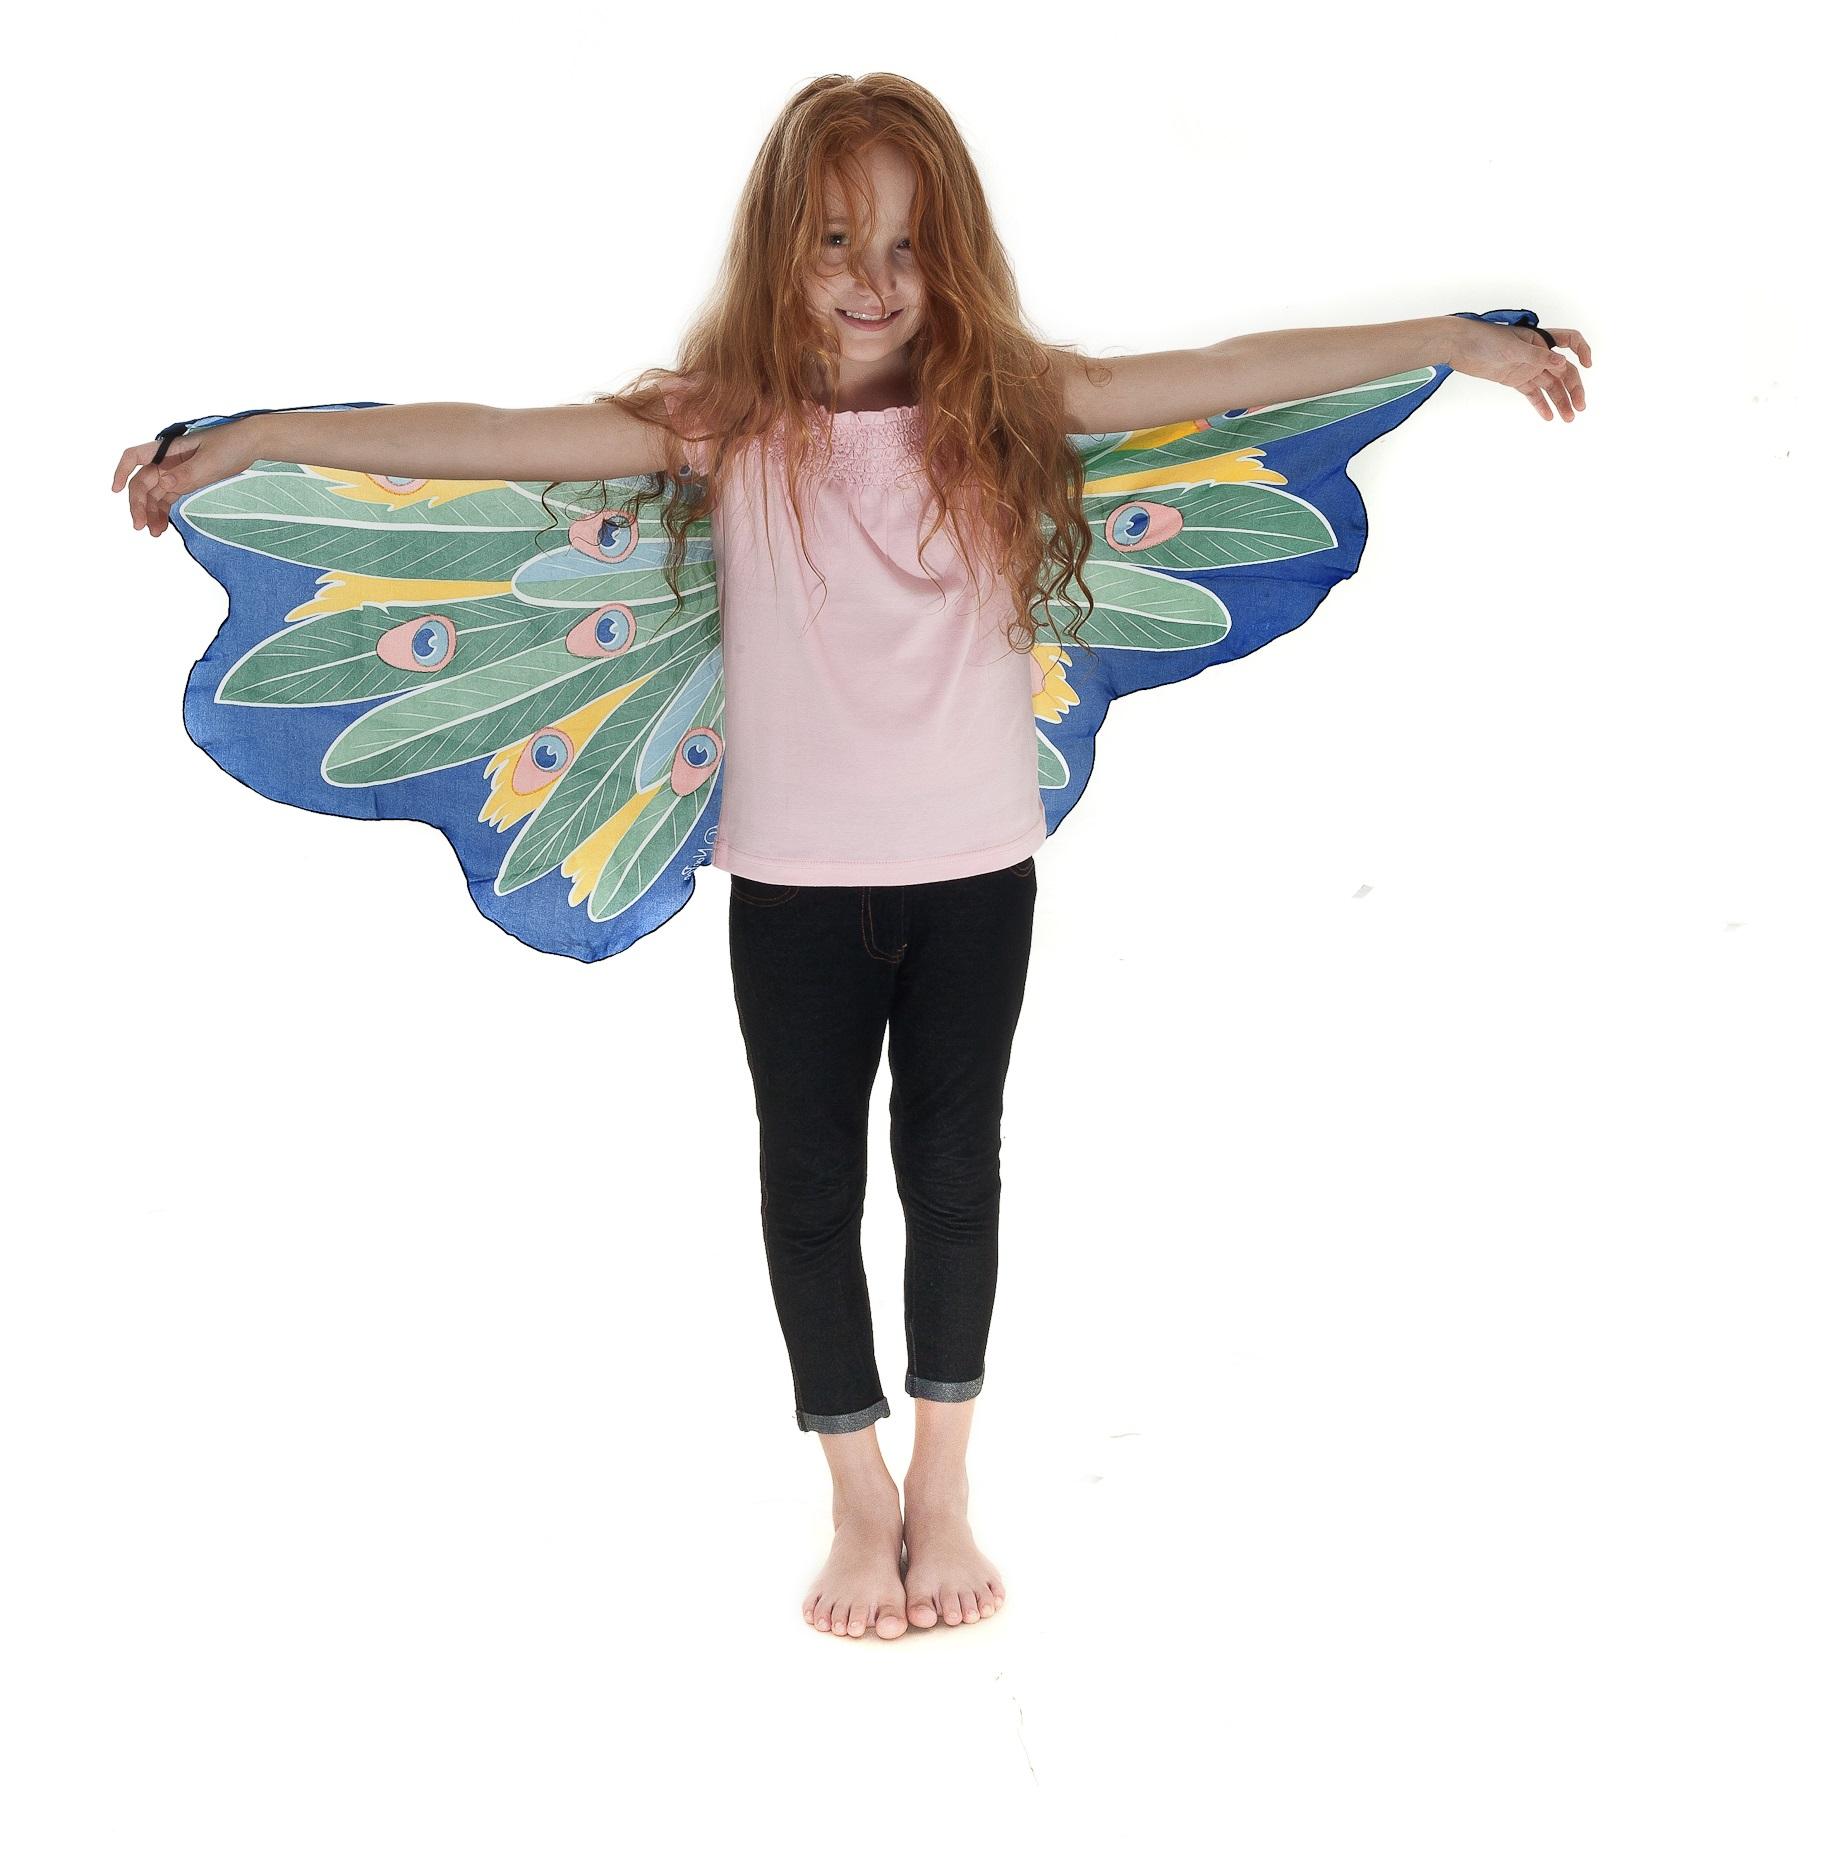 Vleugels Pauw Dreamy Dress-Ups